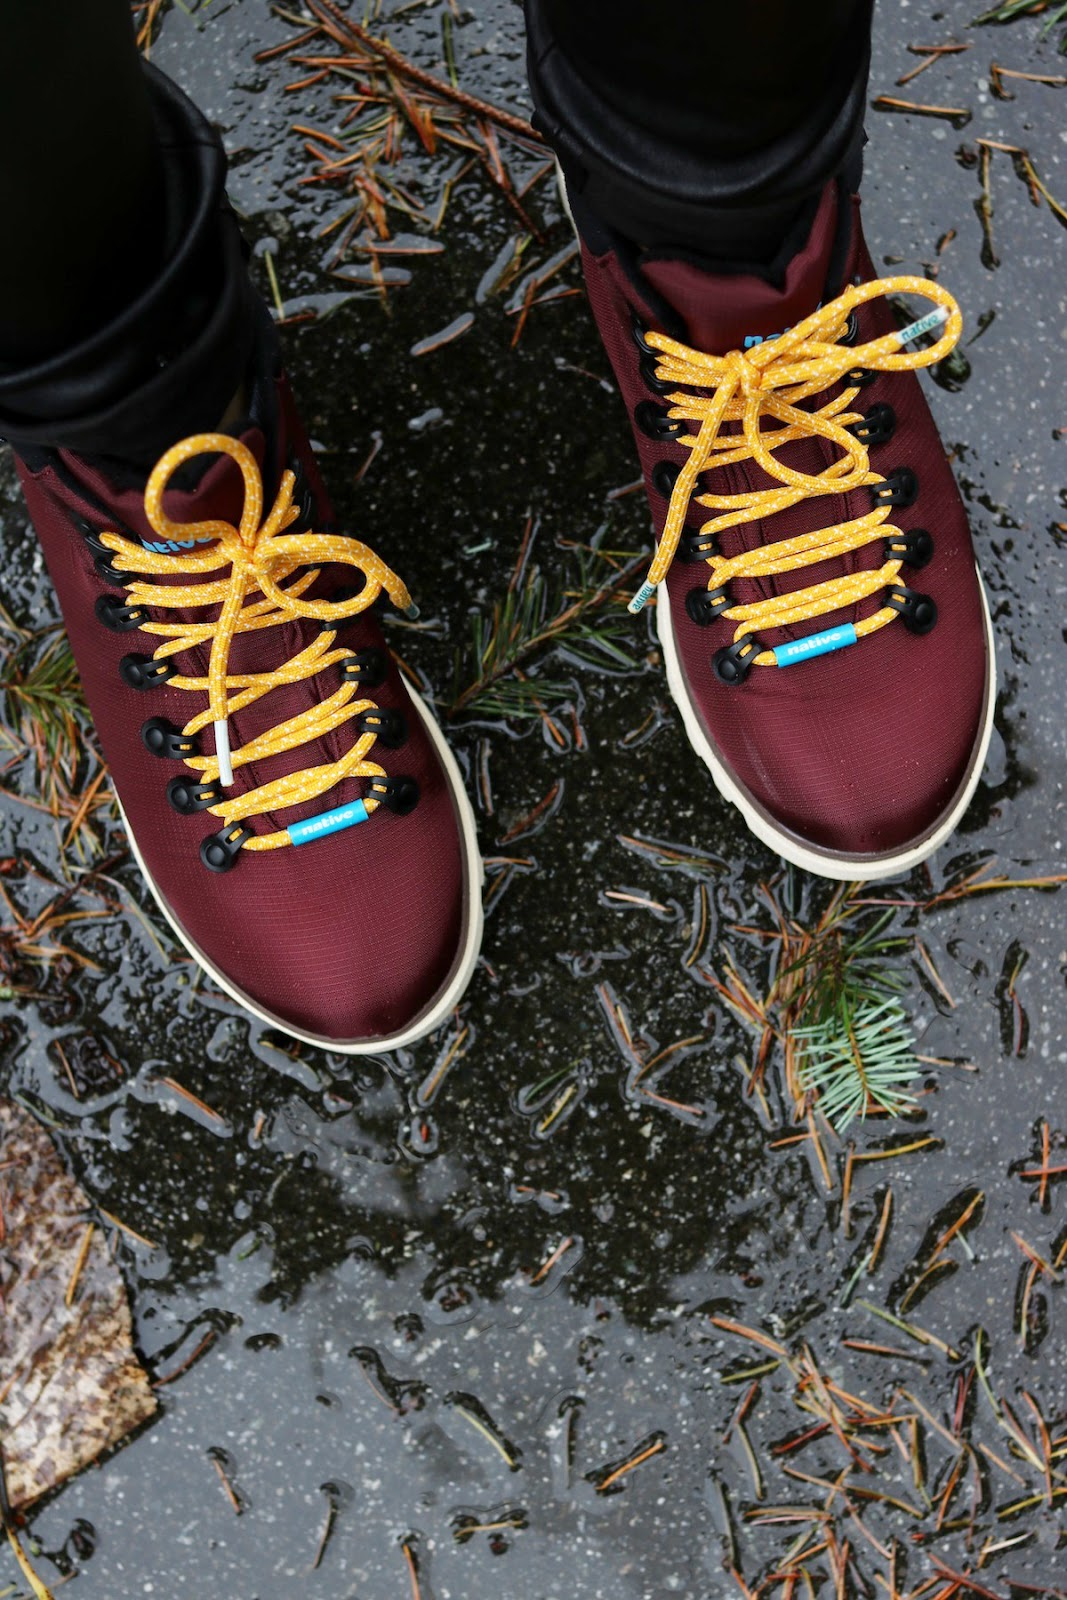 Native Shoes Fitzsimmons Treklite boots